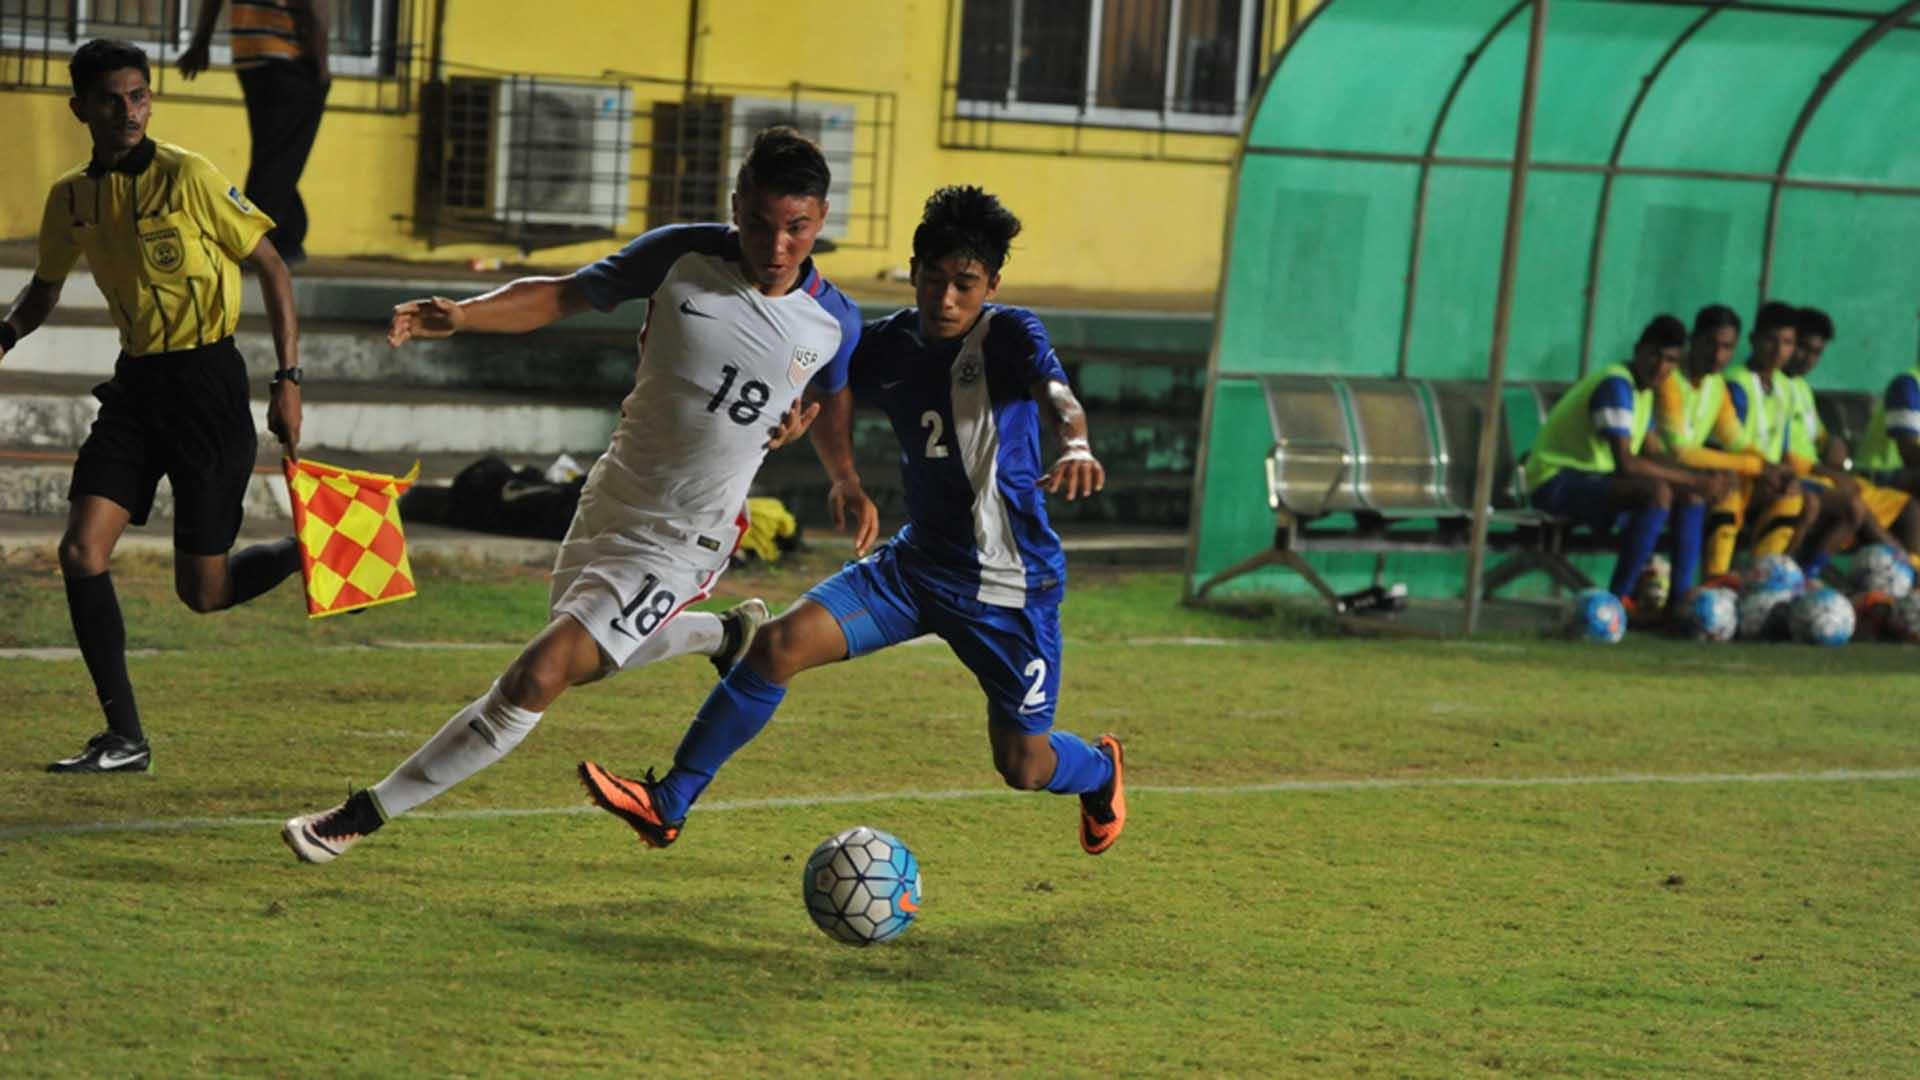 India U-16 USA AIFF Youth Cup 2016